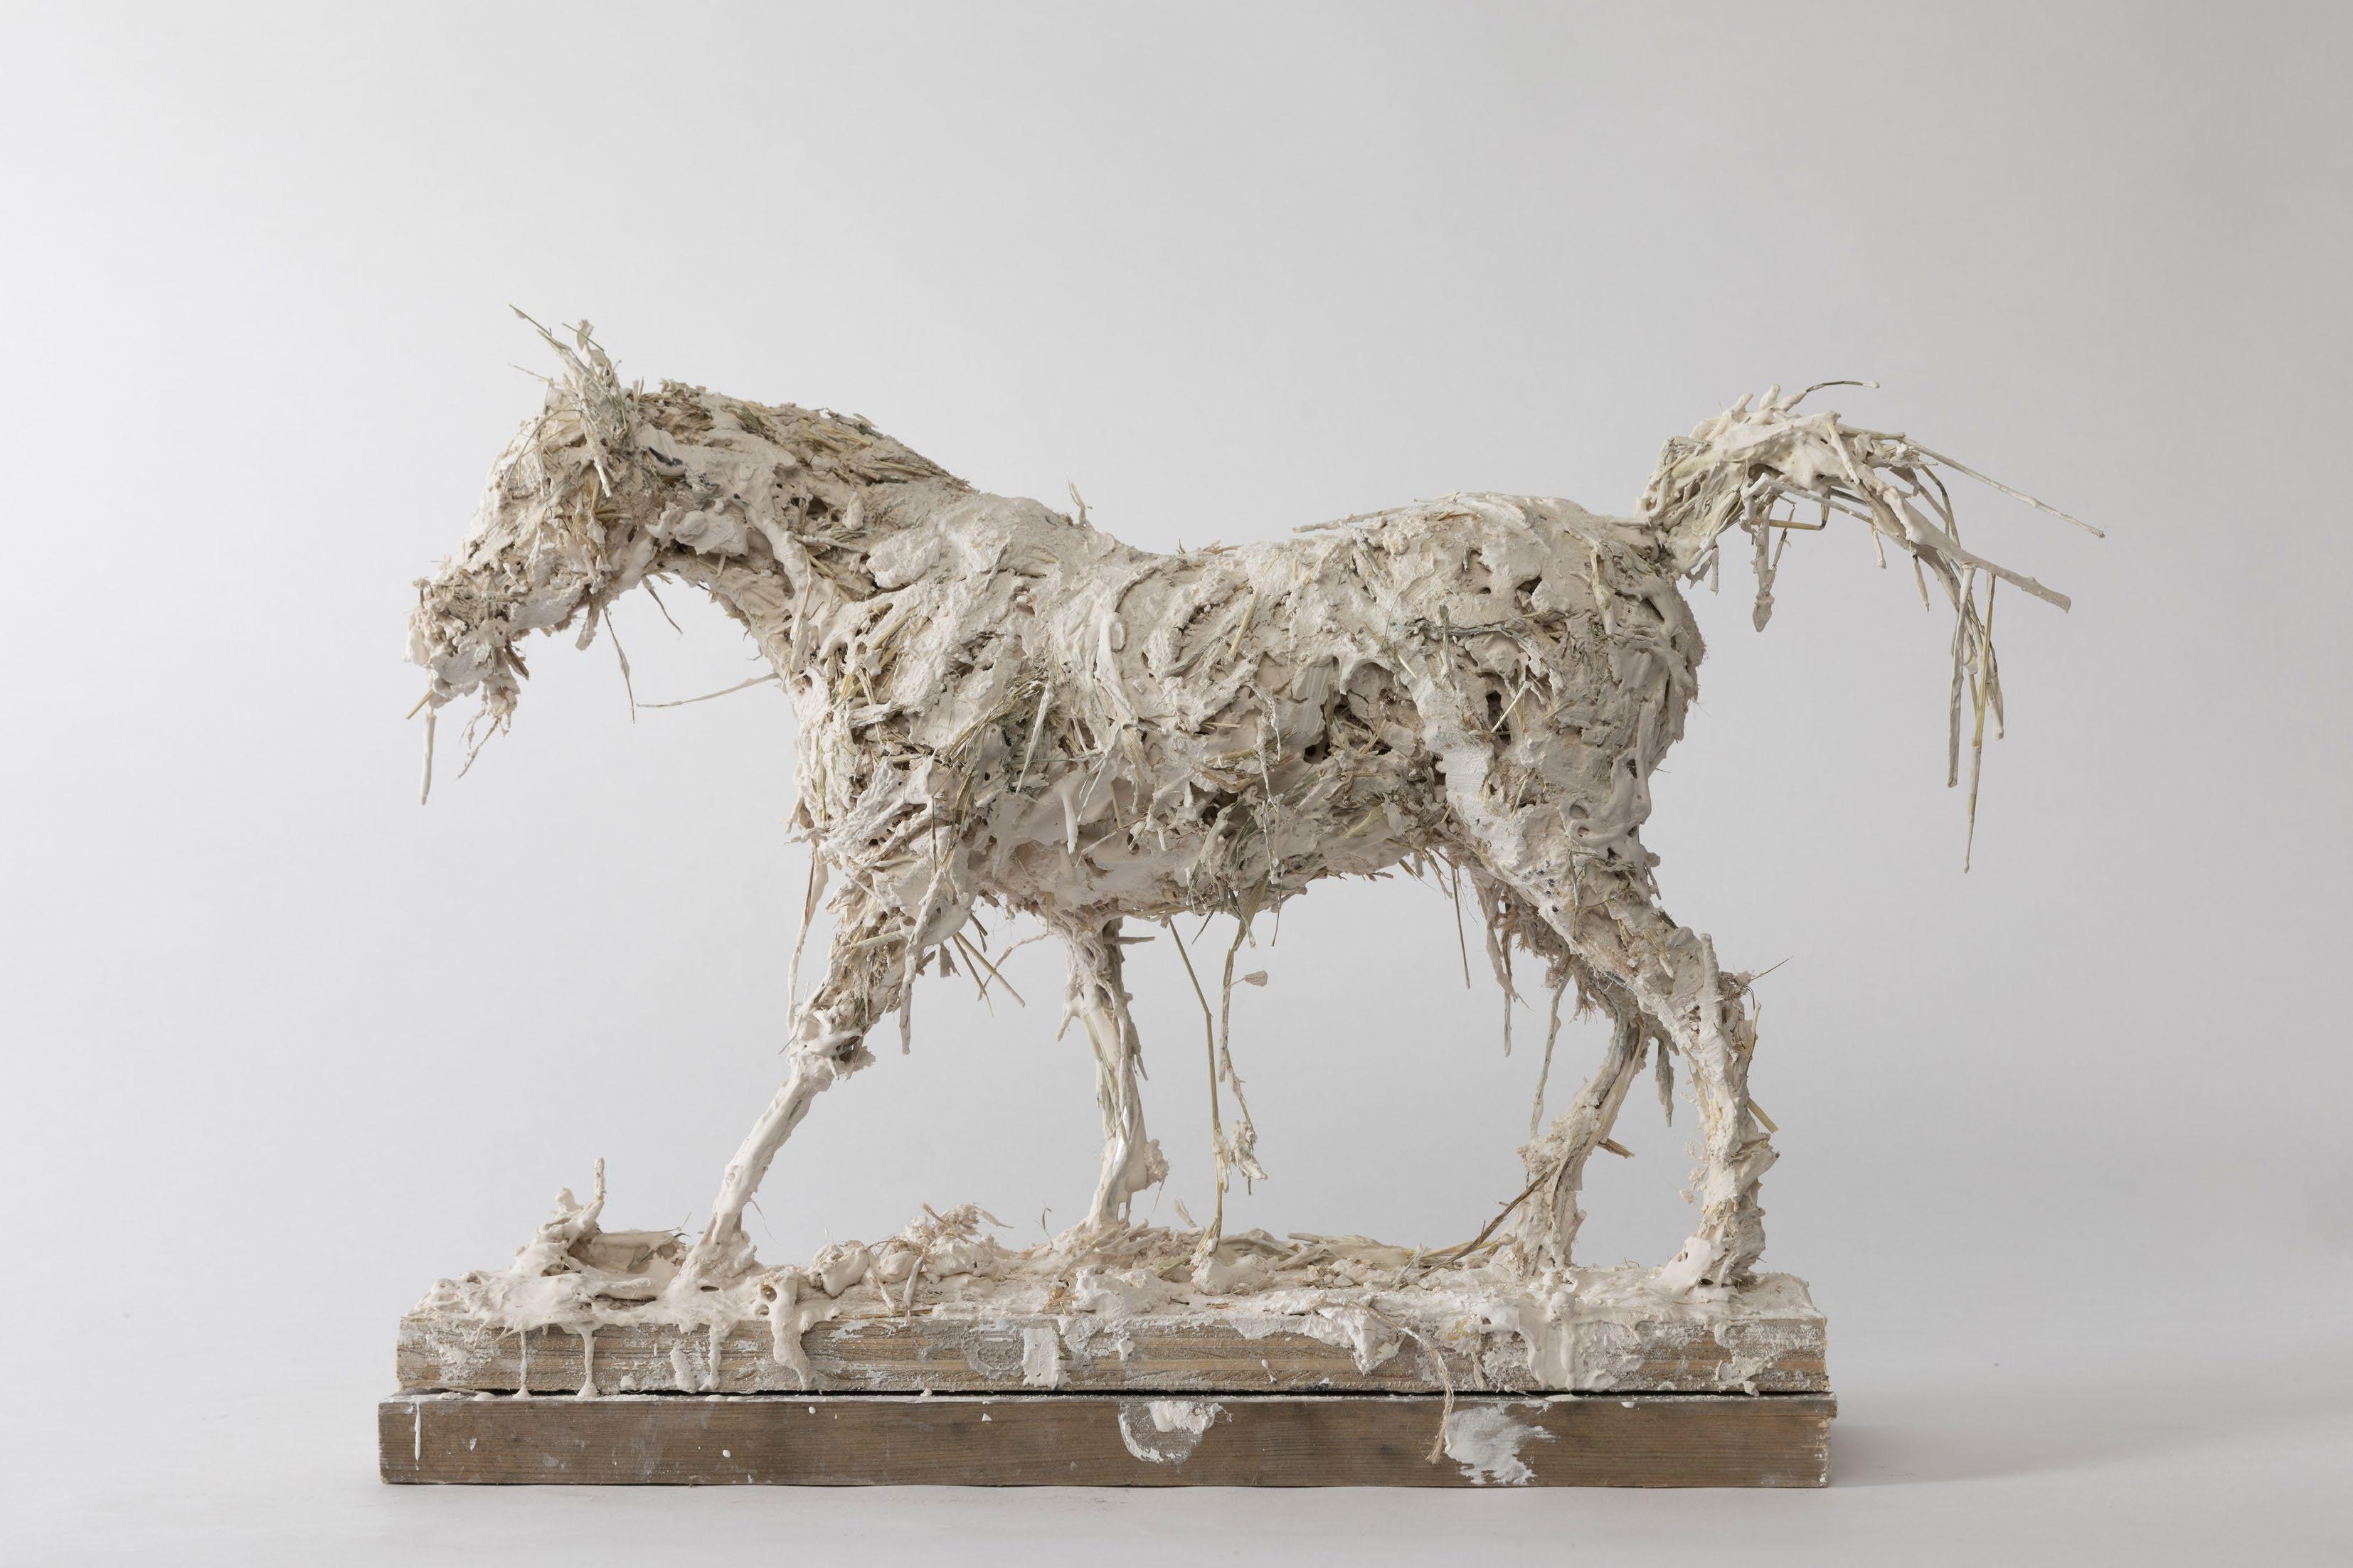 Lot 2.7 - 'Pretty Horse' by Nicola Hicks MBE